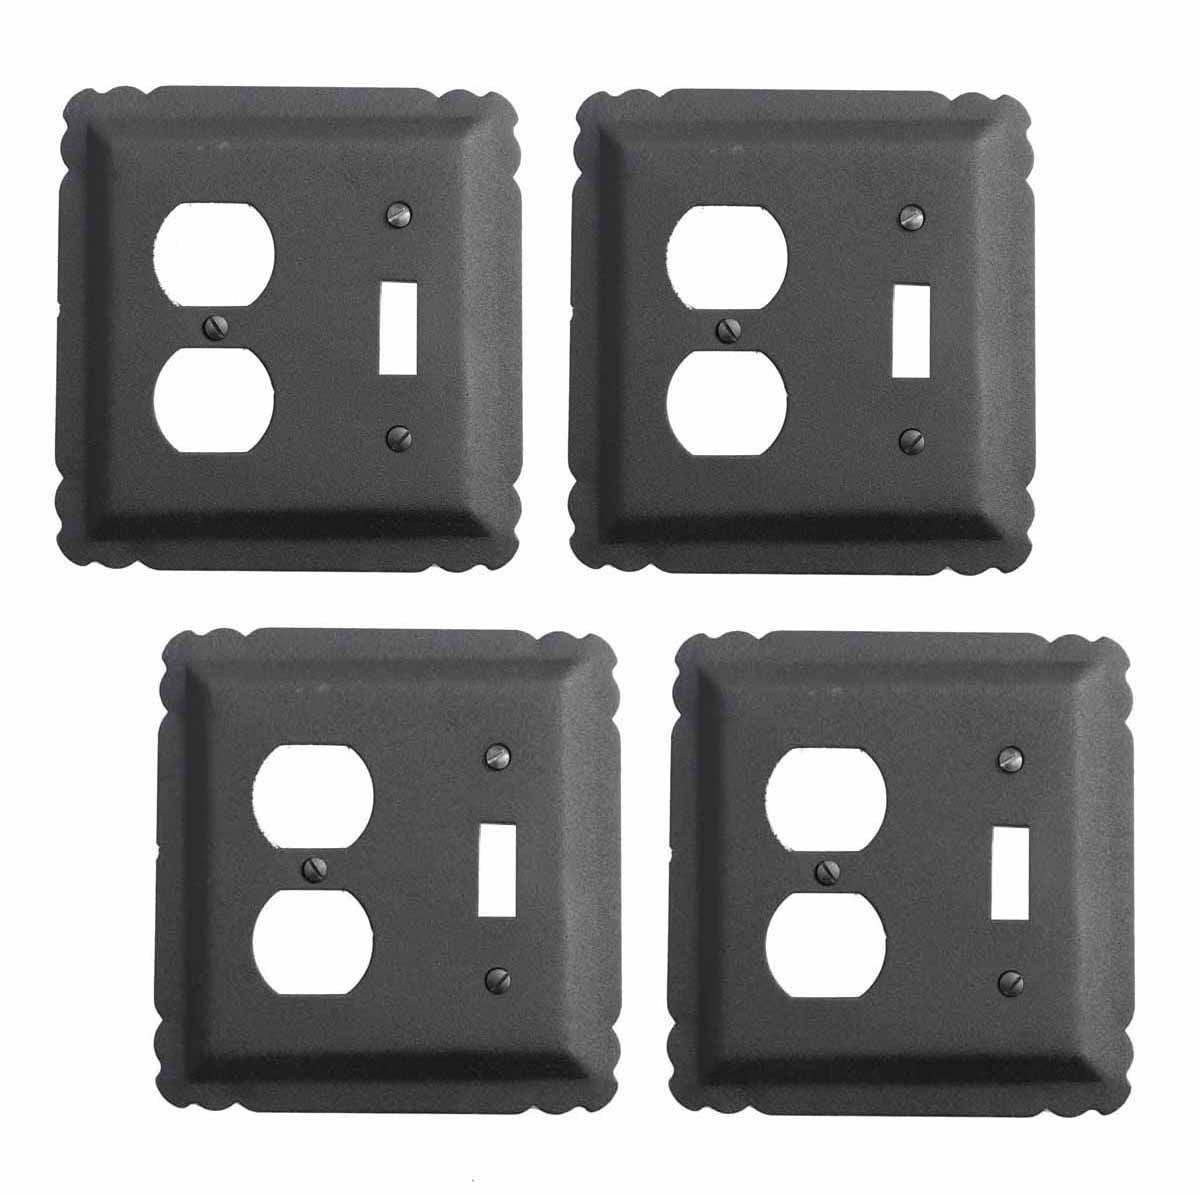 4 Switchplate Black Wrought Iron Toggle/Duplex | Renovator's Supply